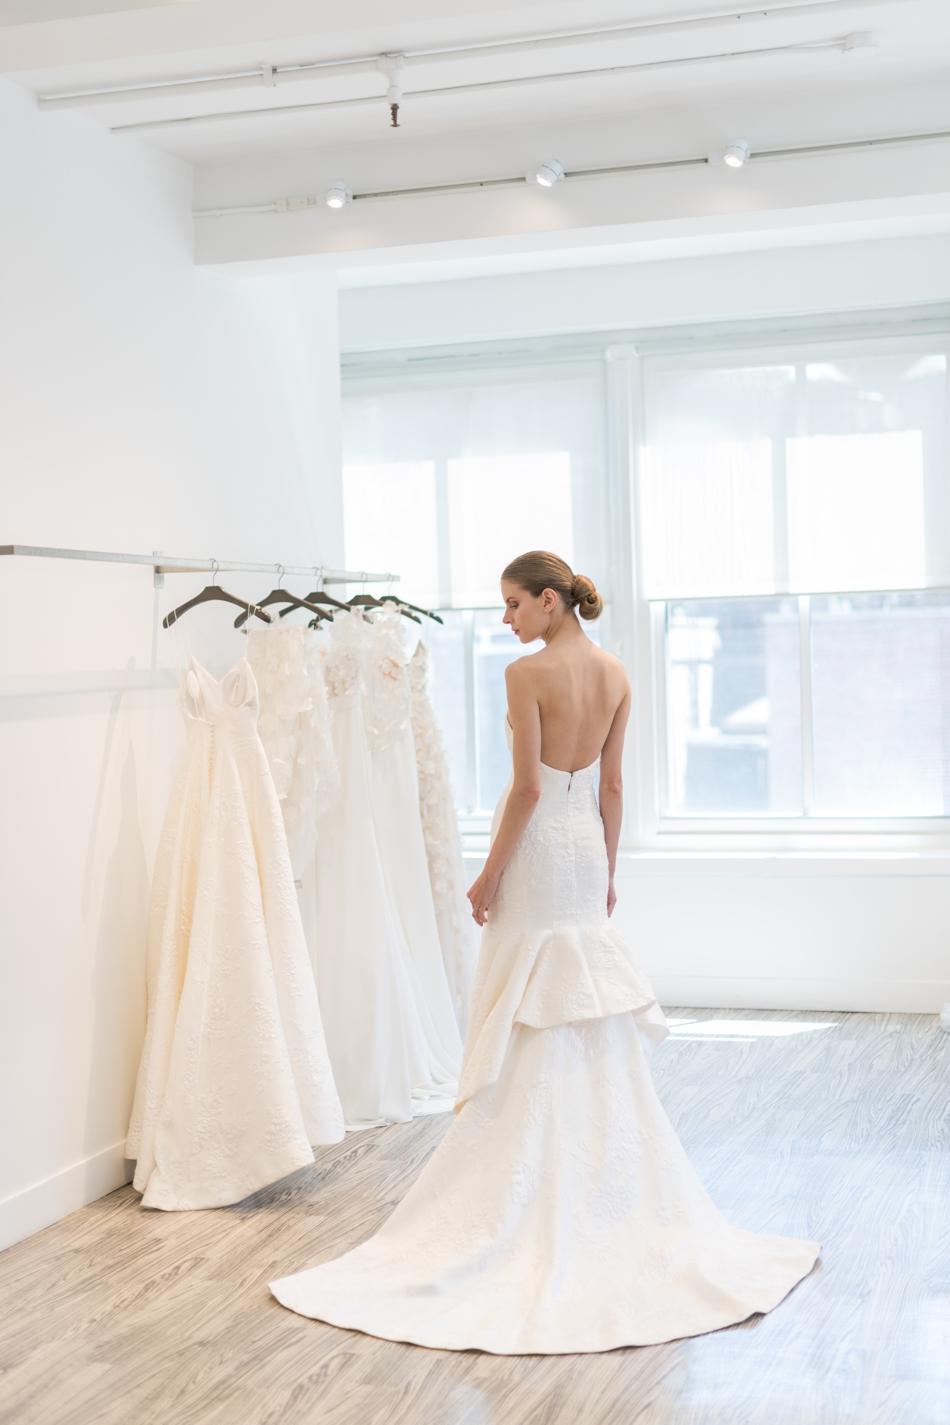 Lela Rose SS18 Bridal